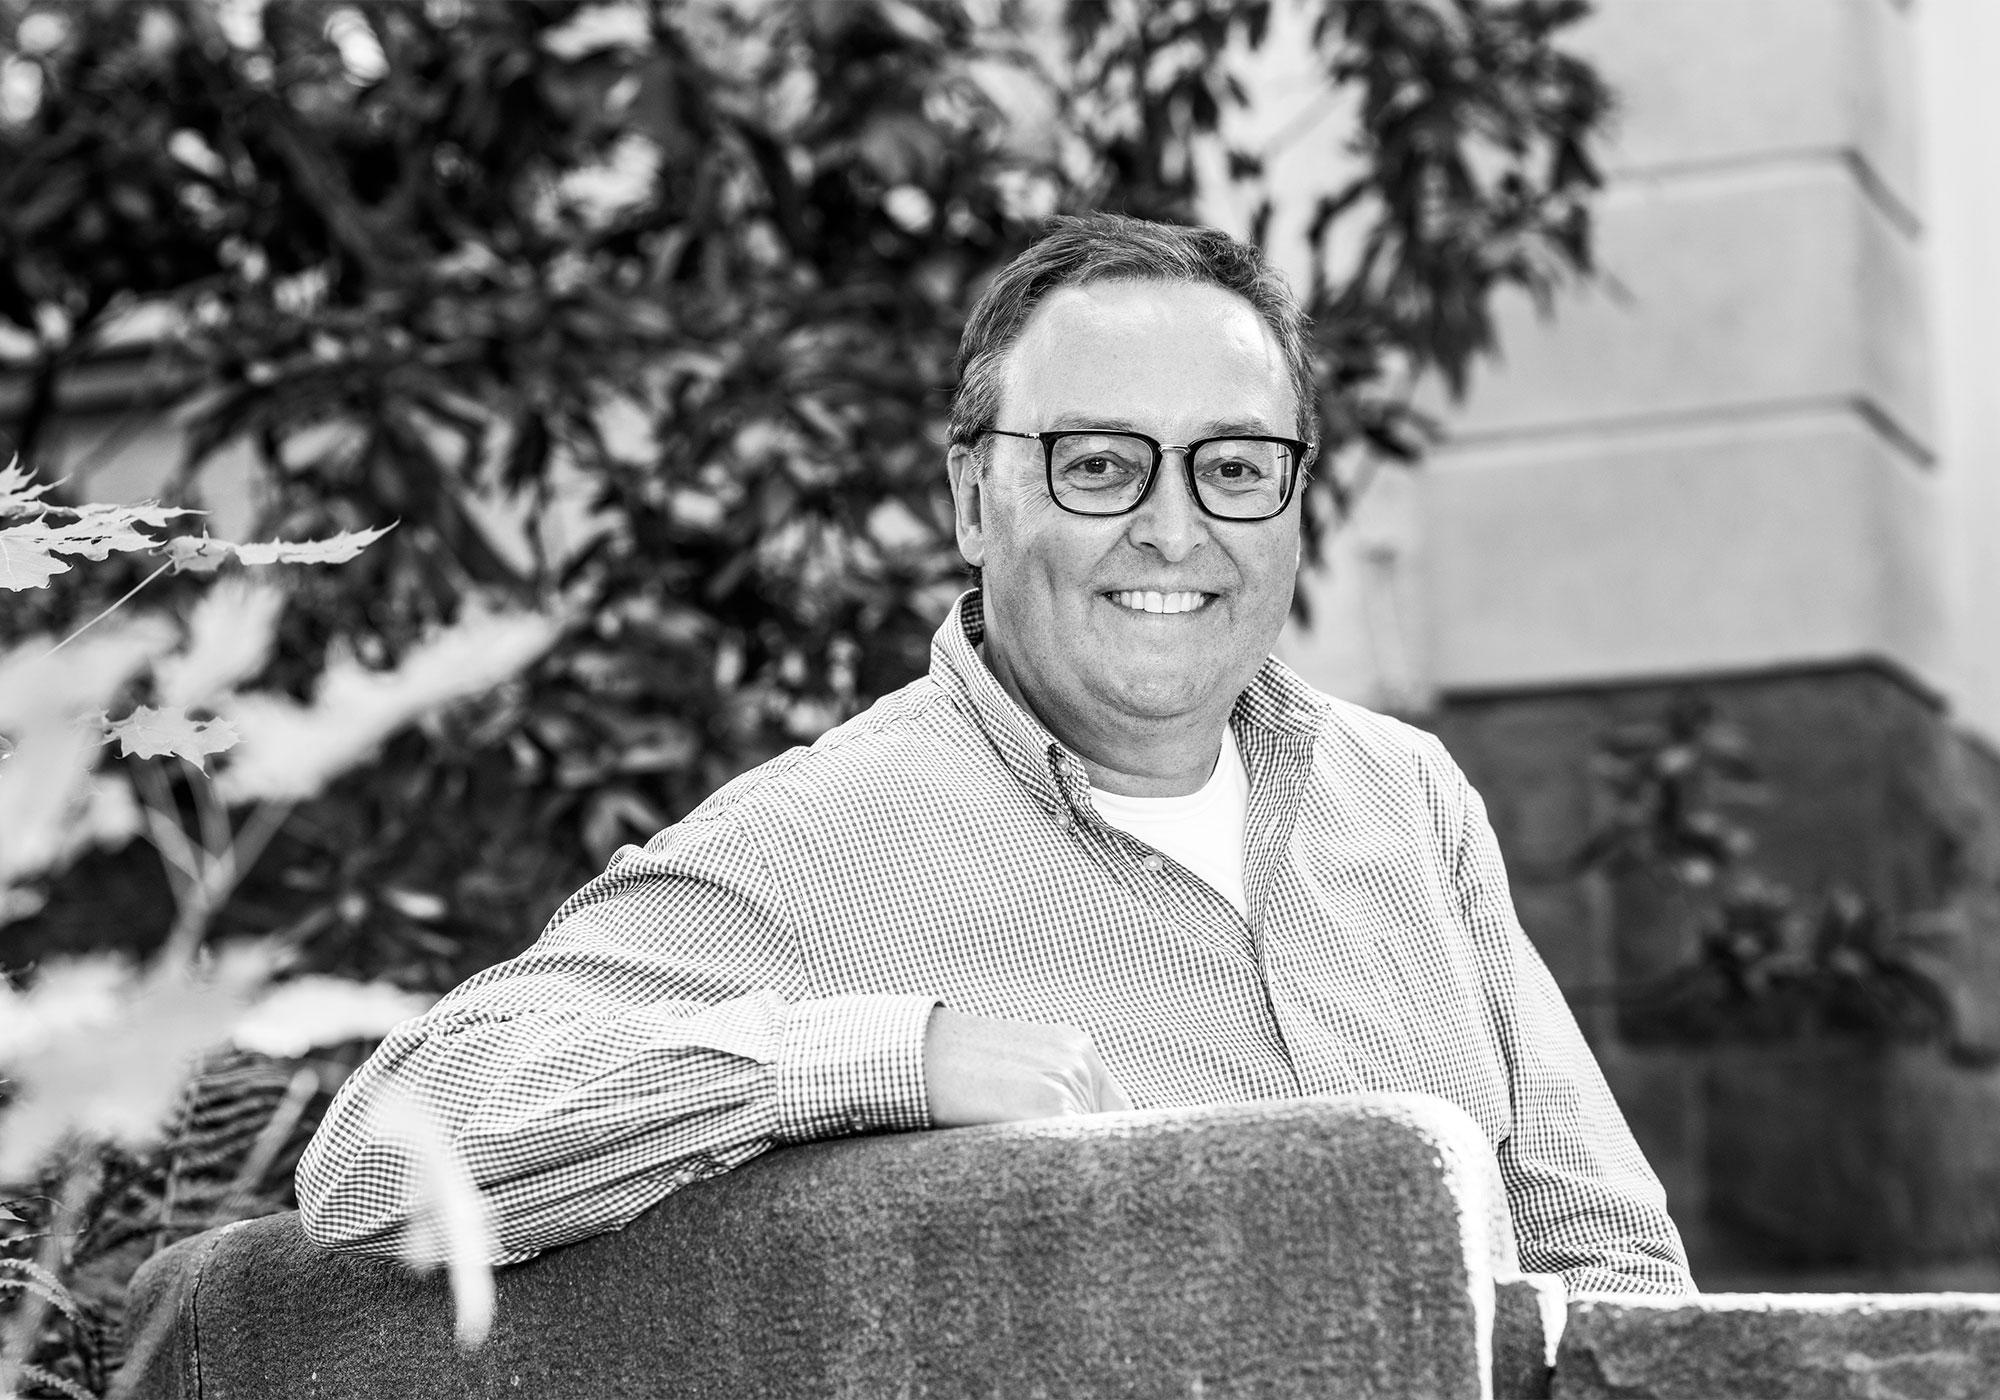 Urologe Langenfeld: Dr. med. Andreas Kunze, Facharzt für Urologie und Andrologie